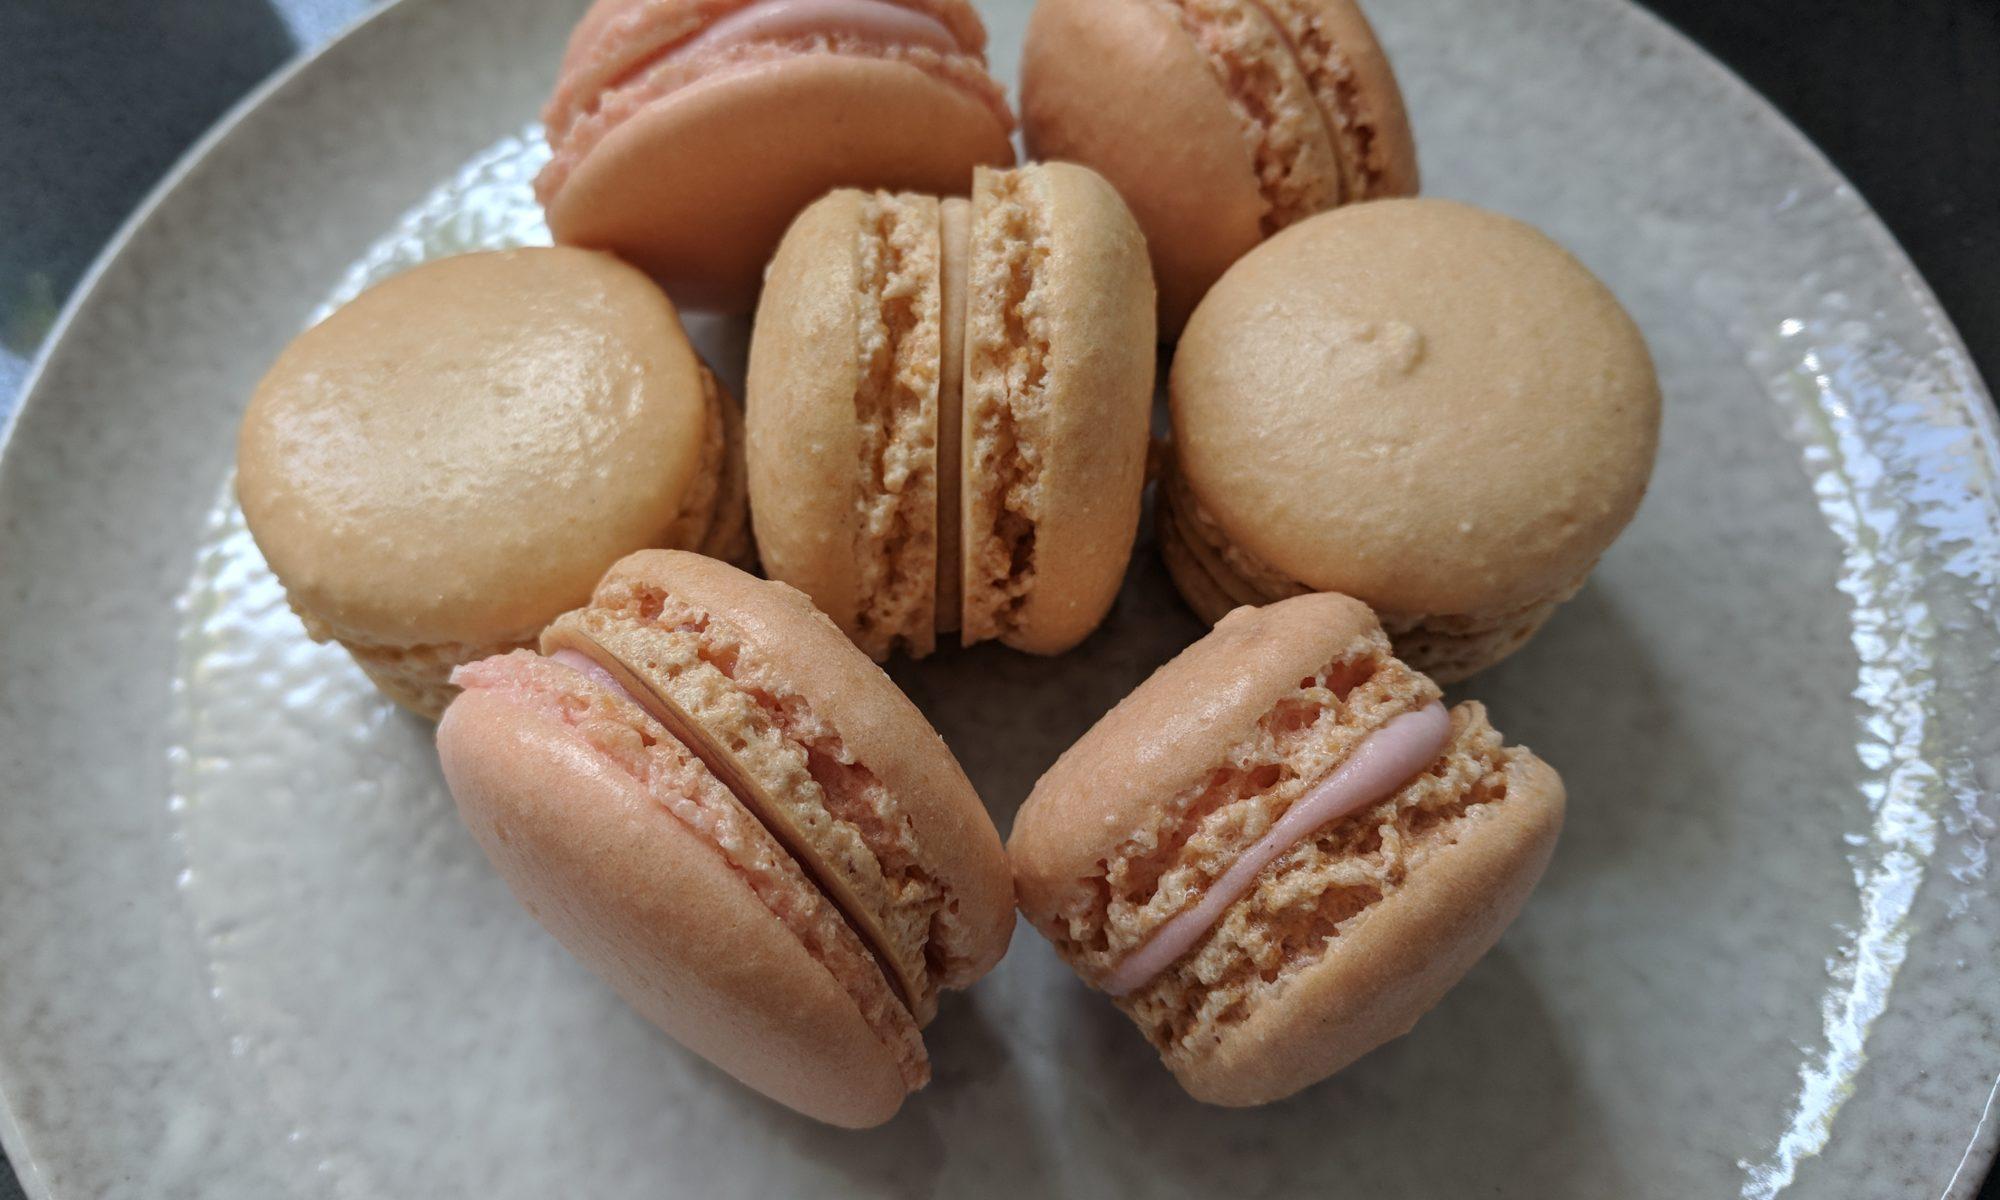 Macarons gezouten karamel salted caramel aardbeiensmaak aardbeienvulling aardbeien